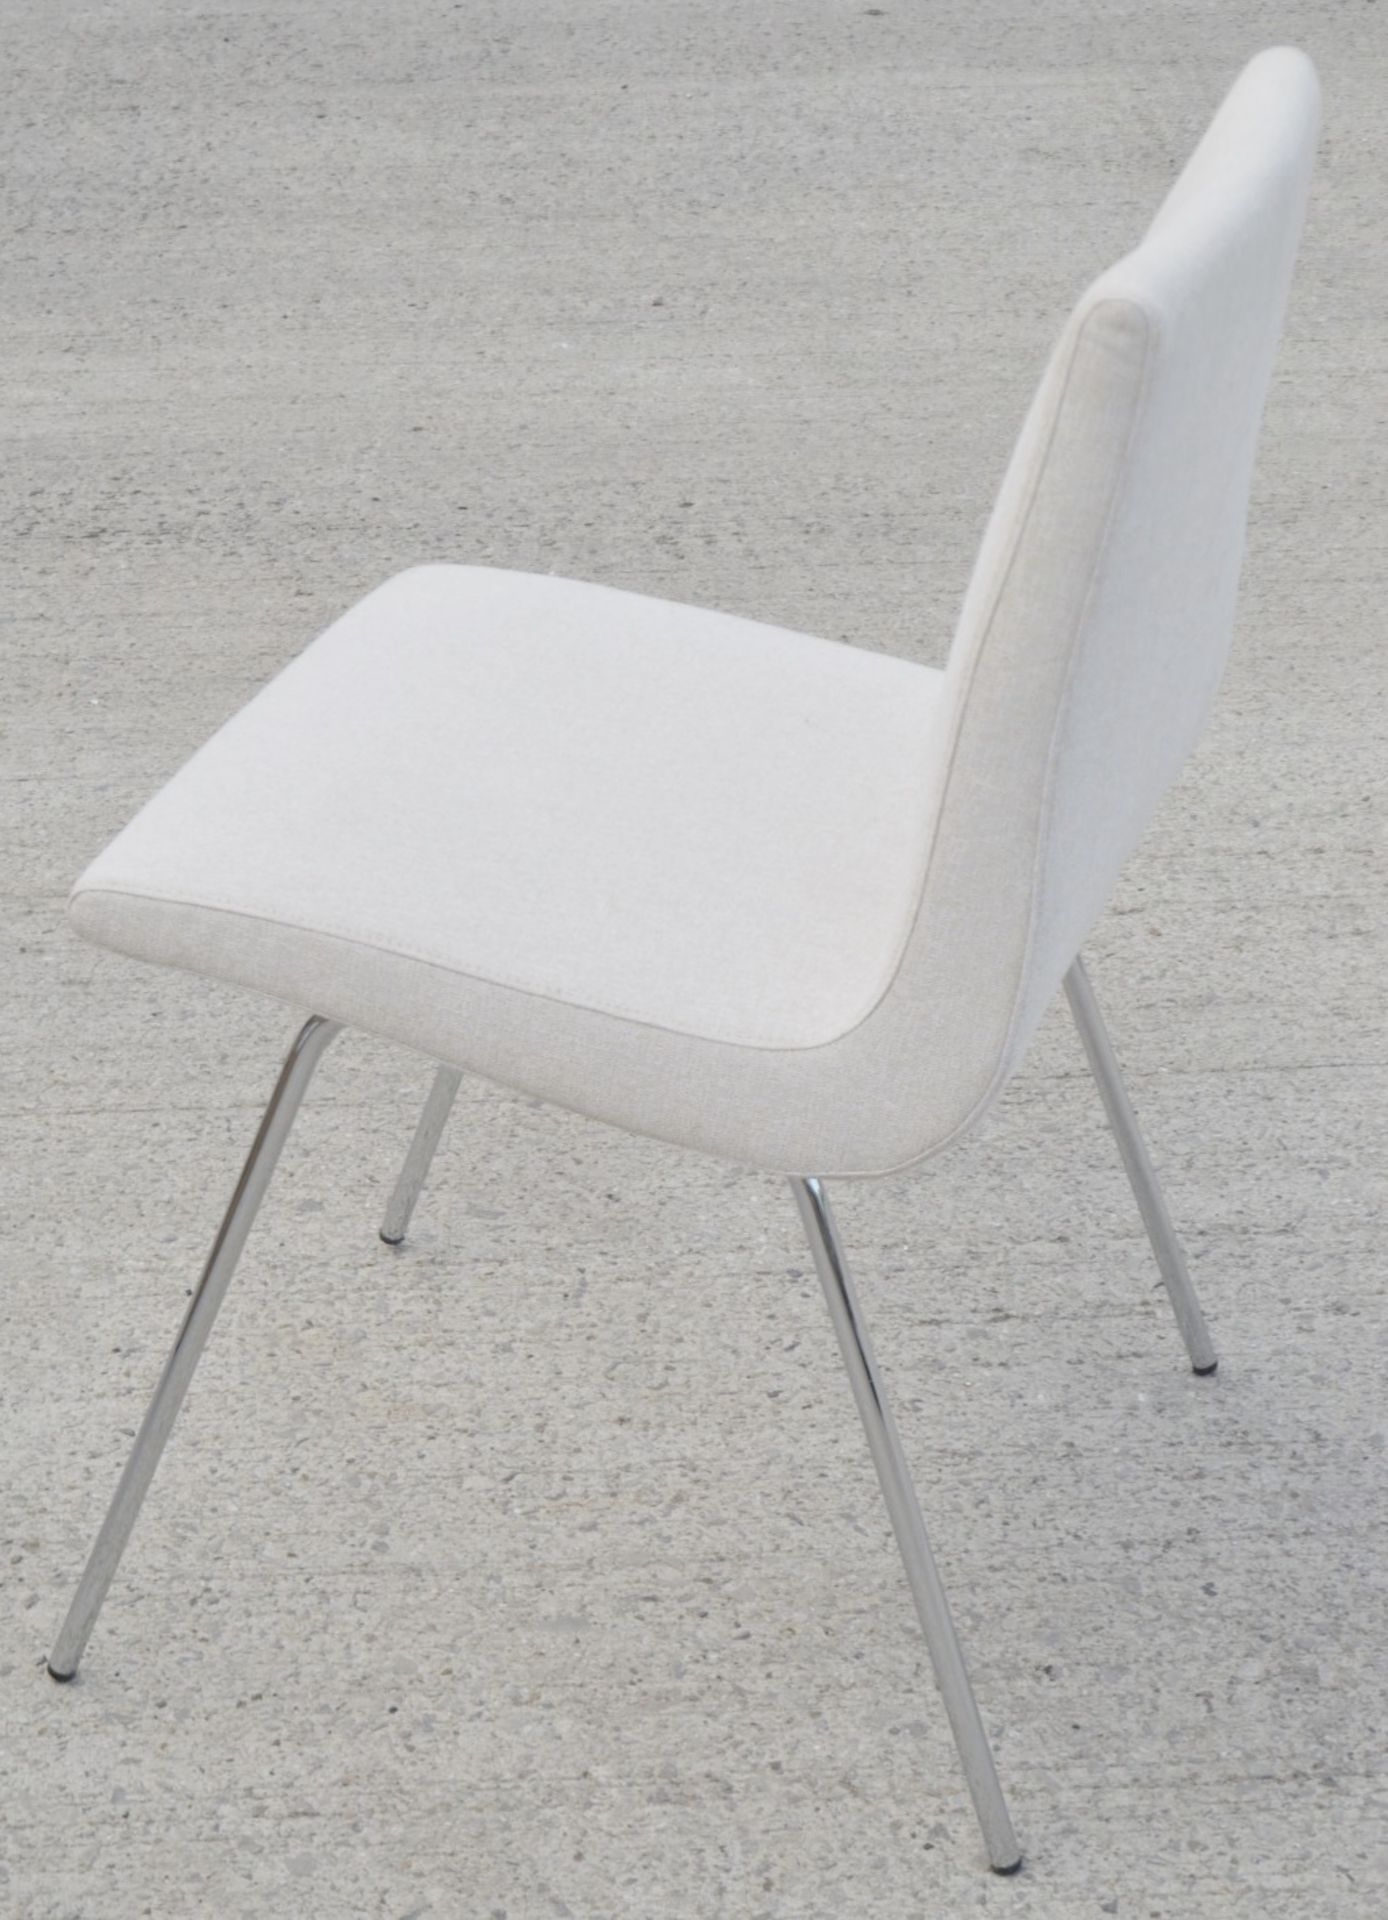 Pair Of LIGNE ROSET 'TV' Designer Dining Chairs In A Light Neutral Beige Fabric & Chromed Steel Legs - Image 2 of 9